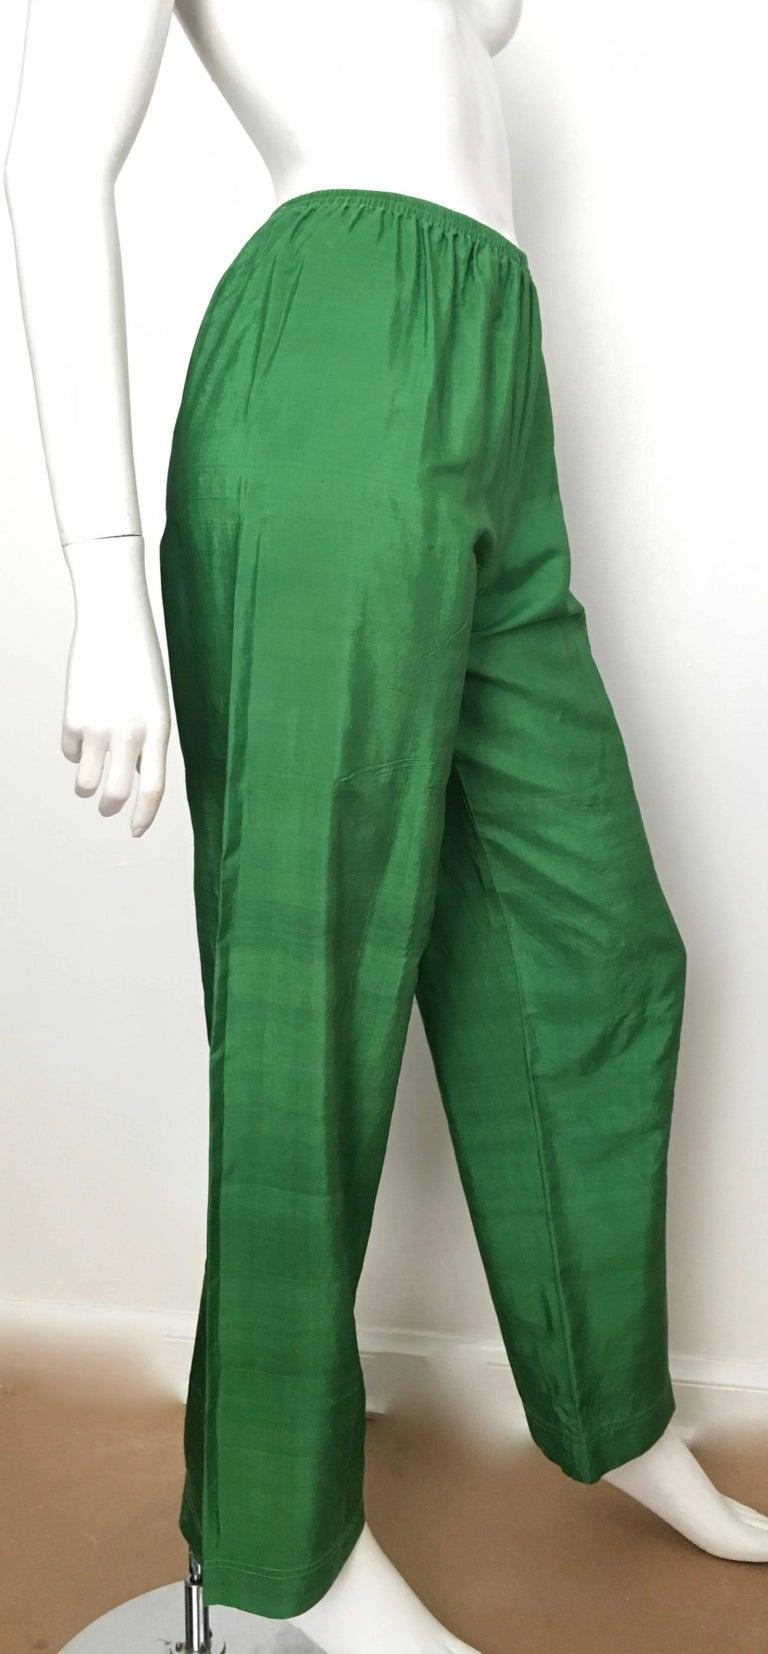 979b742b3018 Women s or Men s Saint Laurent Rive Gauche 1970s Green Silk Pants Size 4.  For Sale